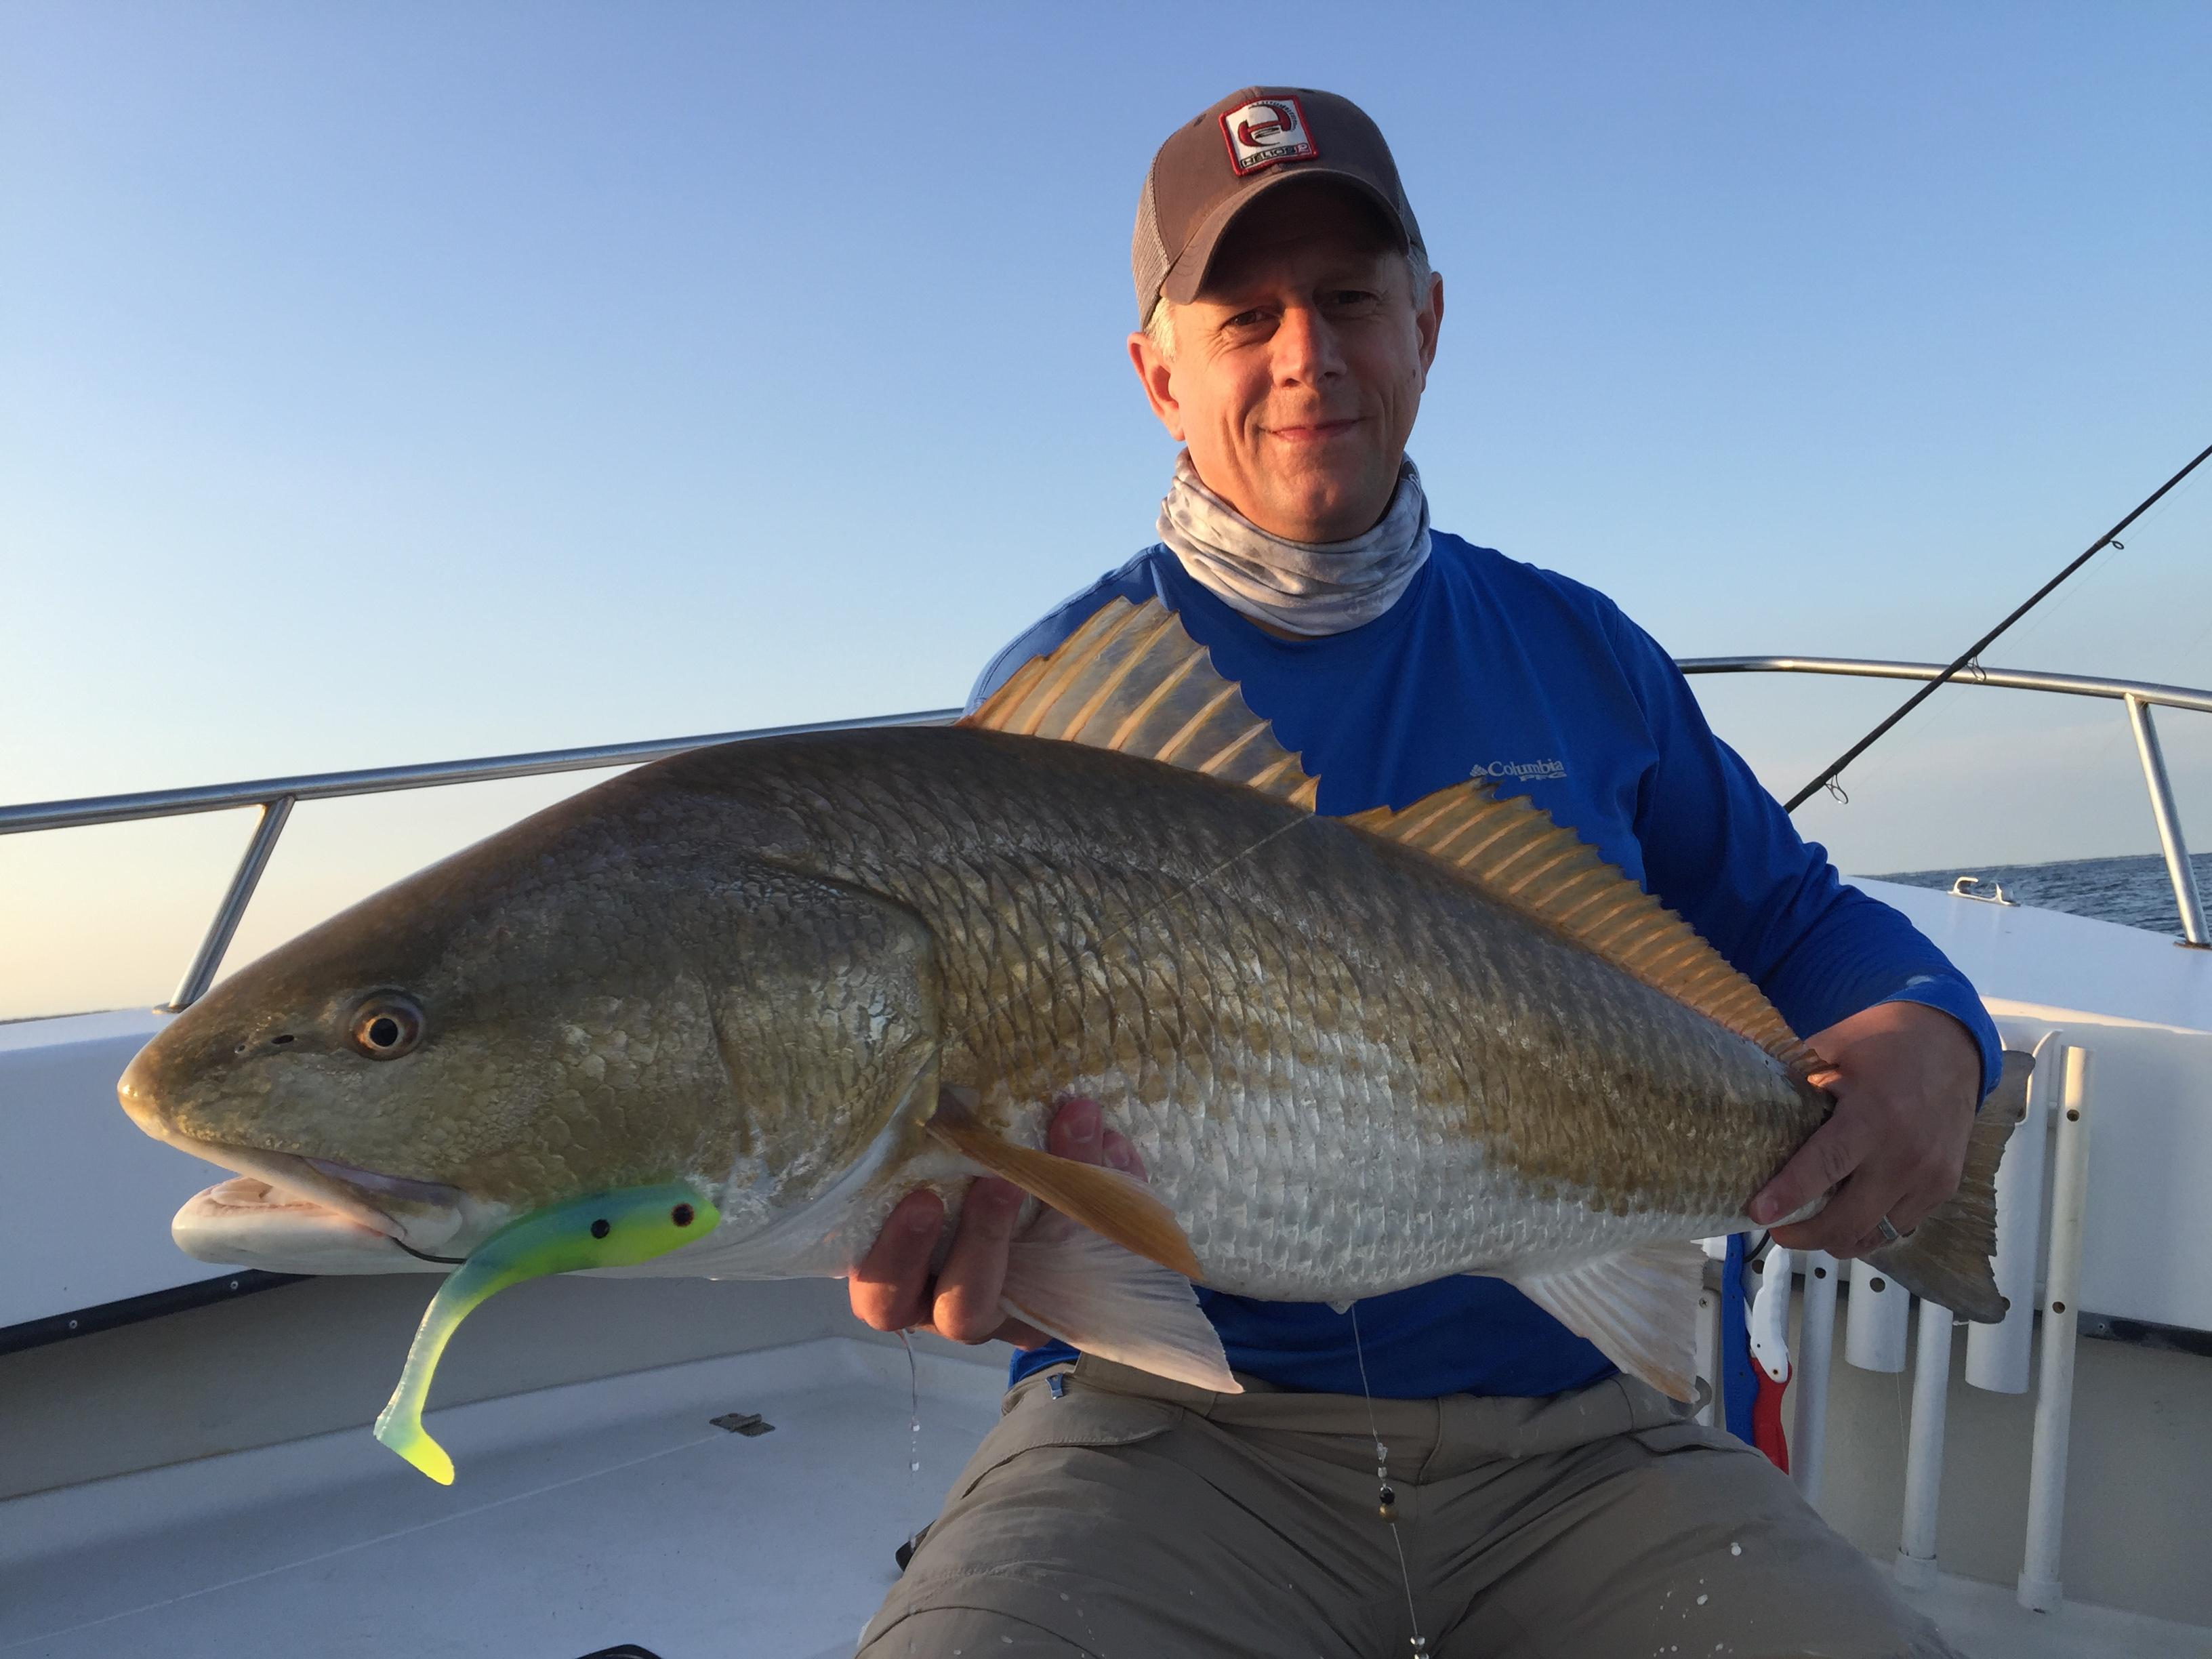 Fall fishing fishibx eastern nc fishing guide for Northeast saltwater fishing reports